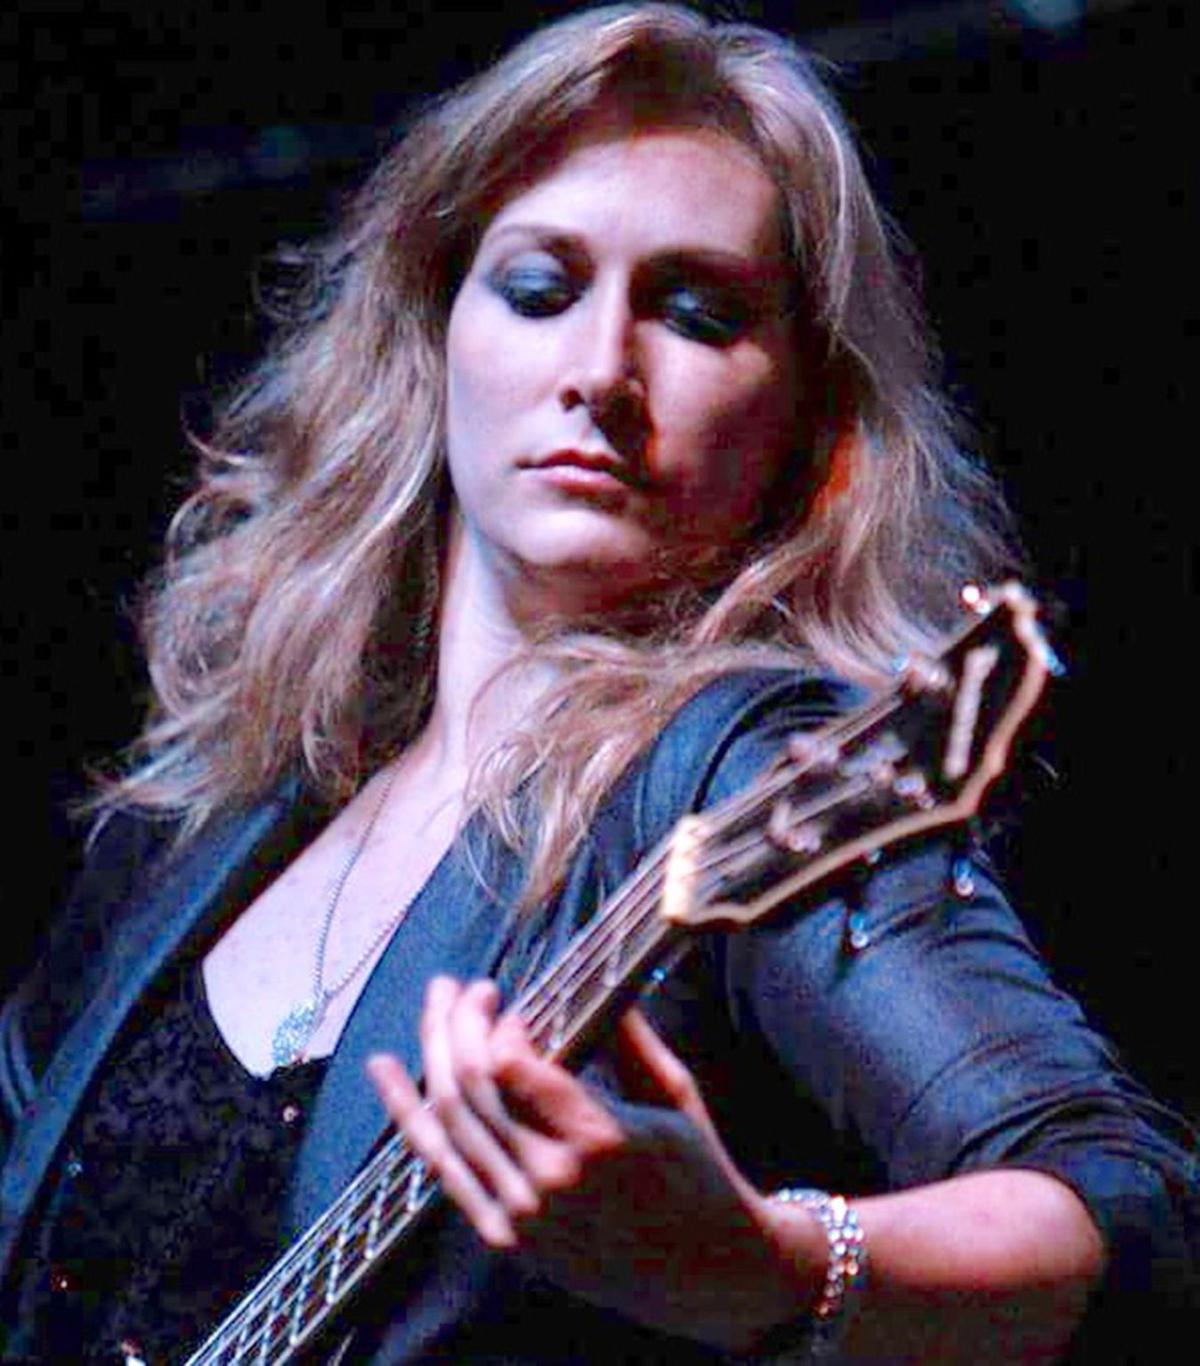 080719_MNS_A1_lead_concert_002 Kristen Tinsley